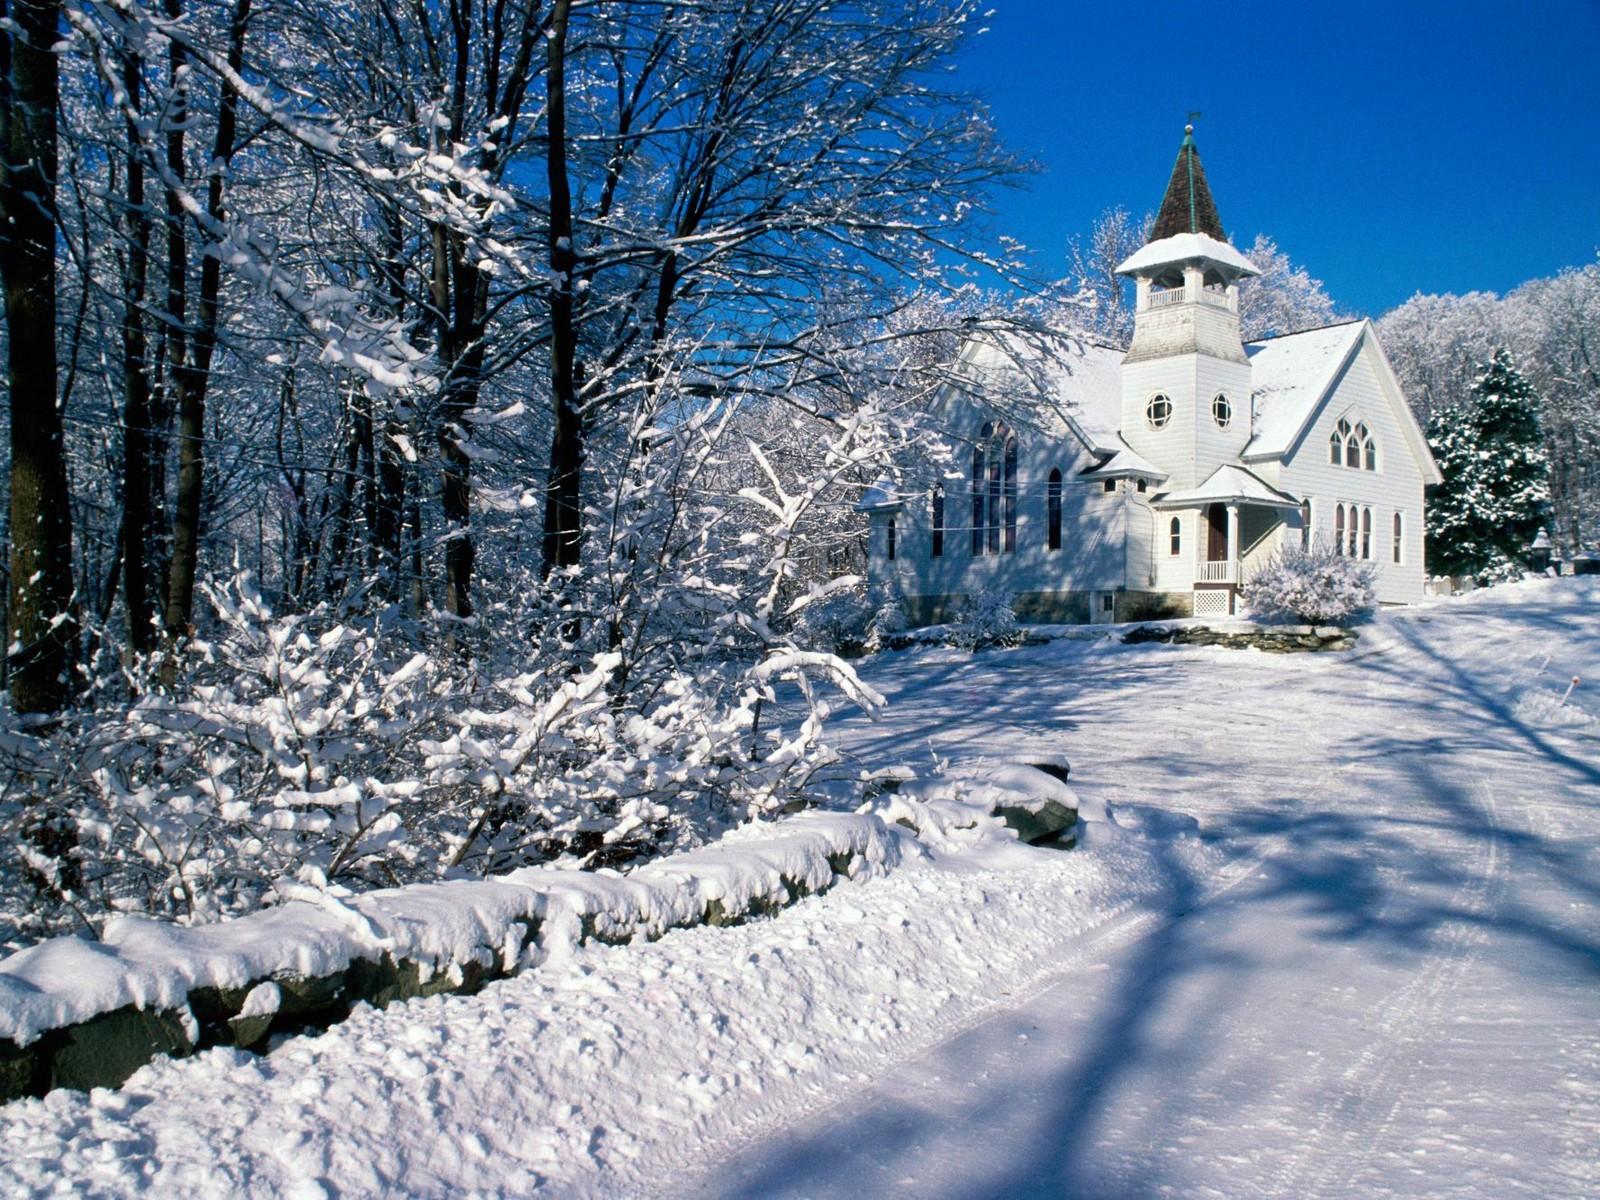 wallpaper hiver neige montagne 1600x1200